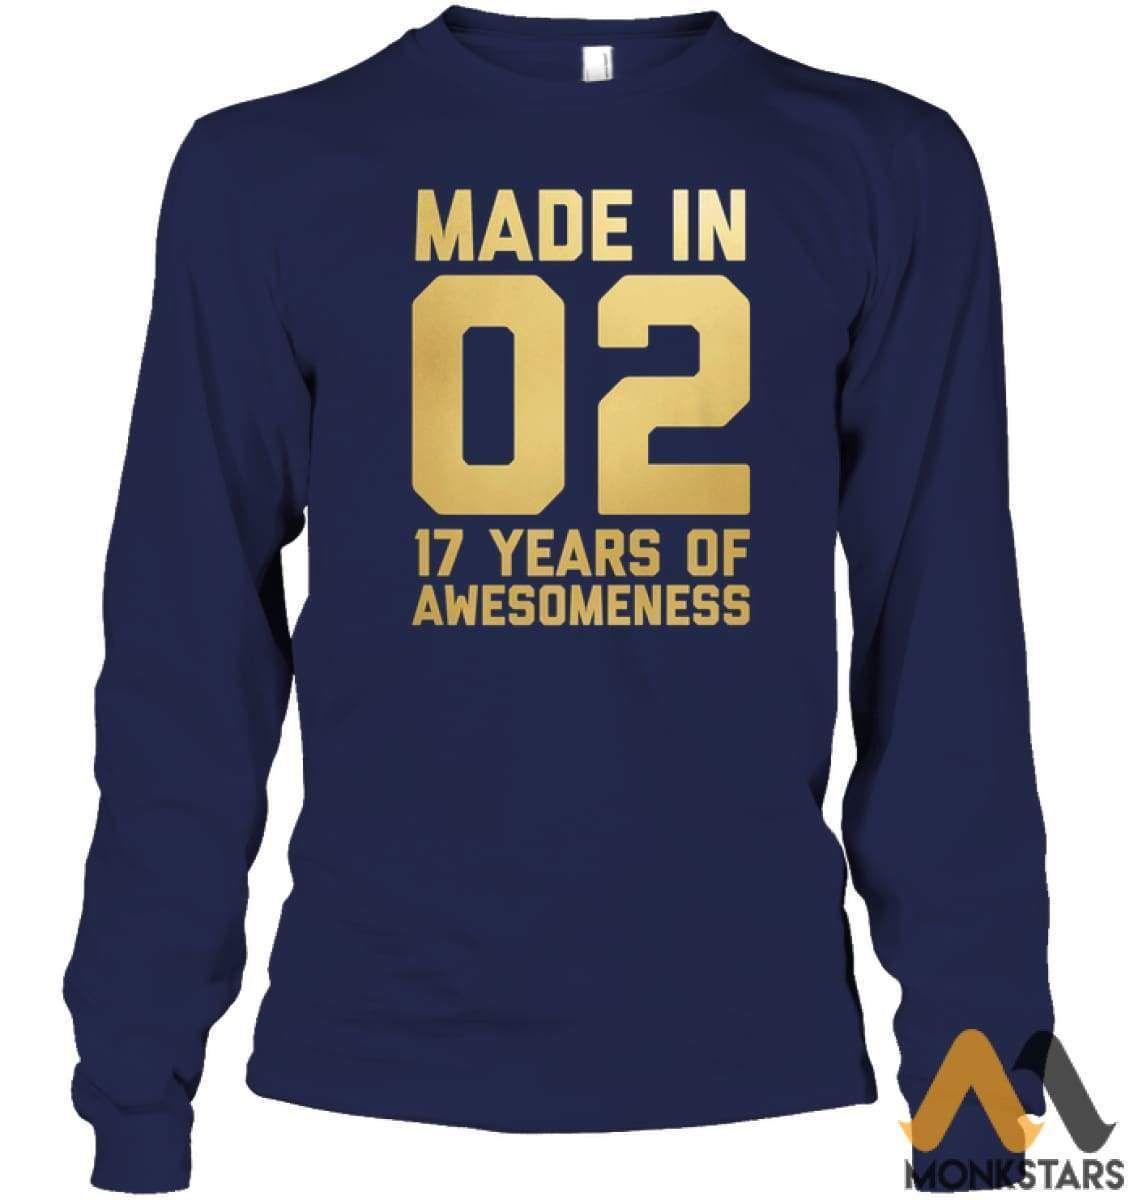 17th Birthday Shirt 17 Year Old Gift Daughter Son Seventeen - Monkstars Inc. #17thbirthday